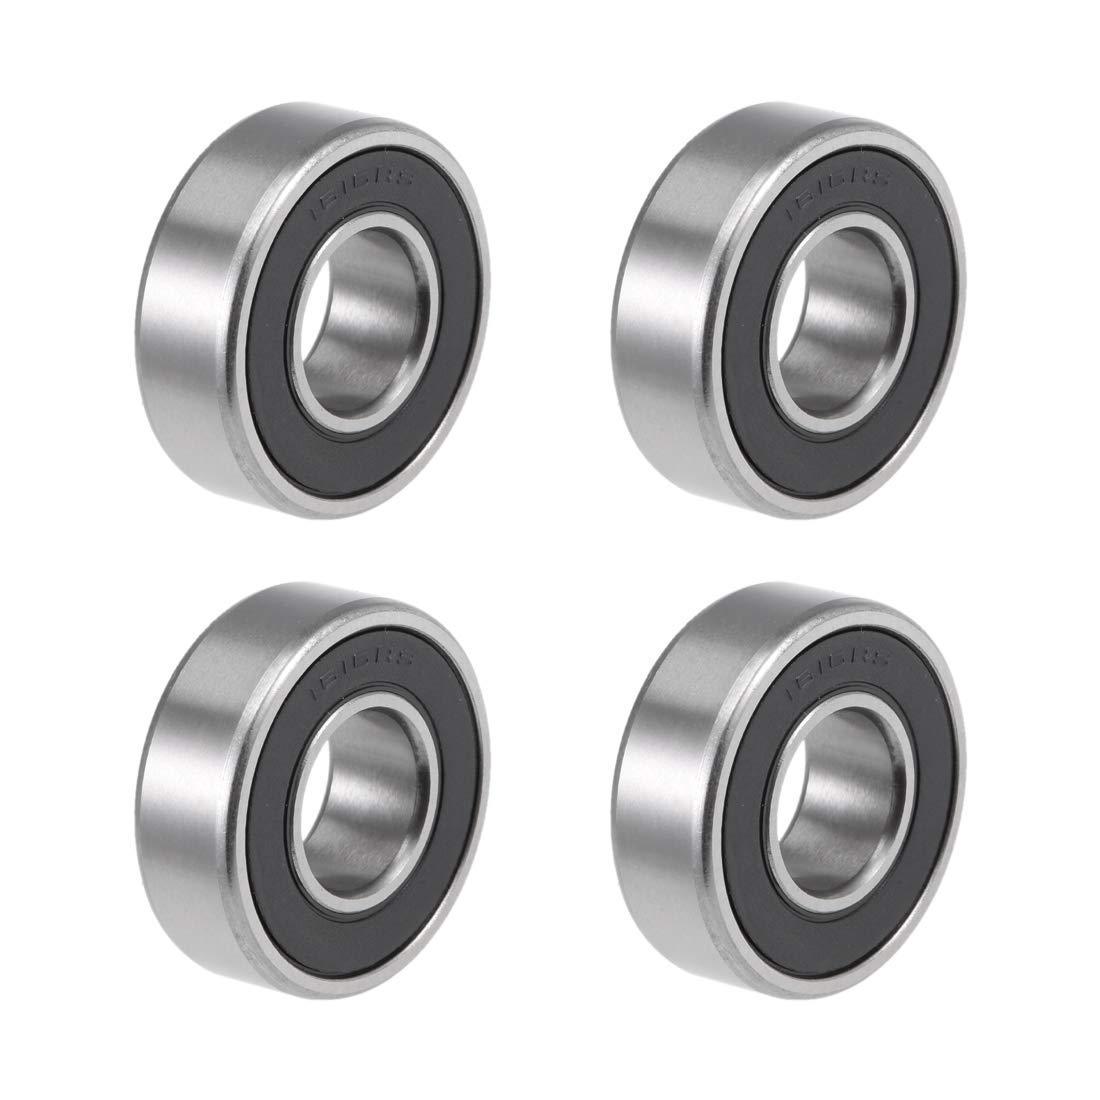 uxcell 1616-2RS Deep Groove Ball Ranking TOP7 8-inchx3 100% quality warranty 1 8 Bearing 2-inchx1-1